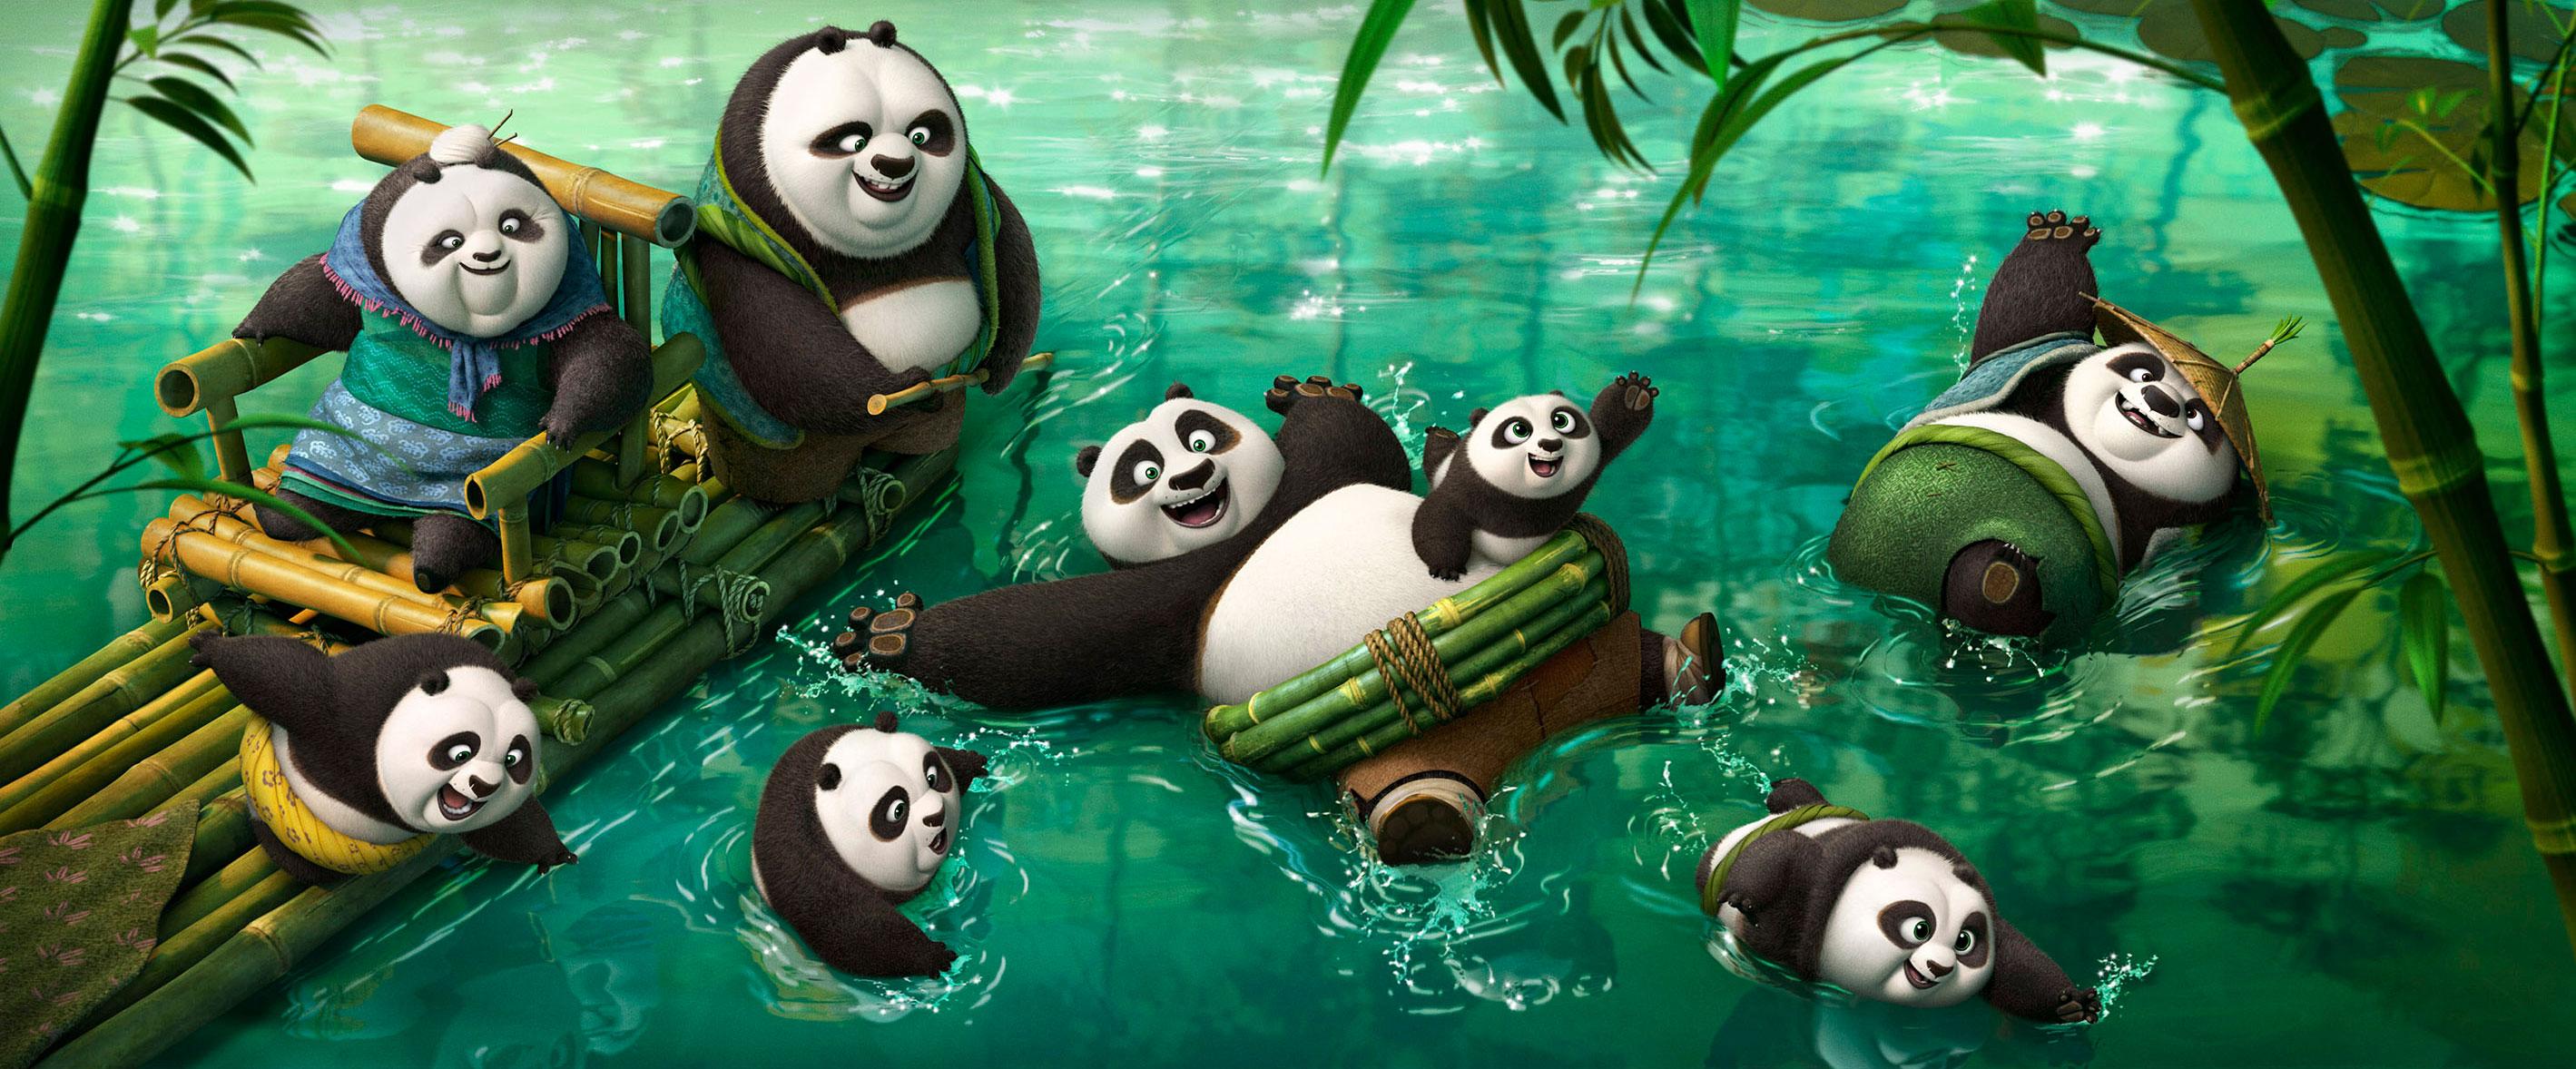 Kung Fu Panda 3 – First Trailer Revealed